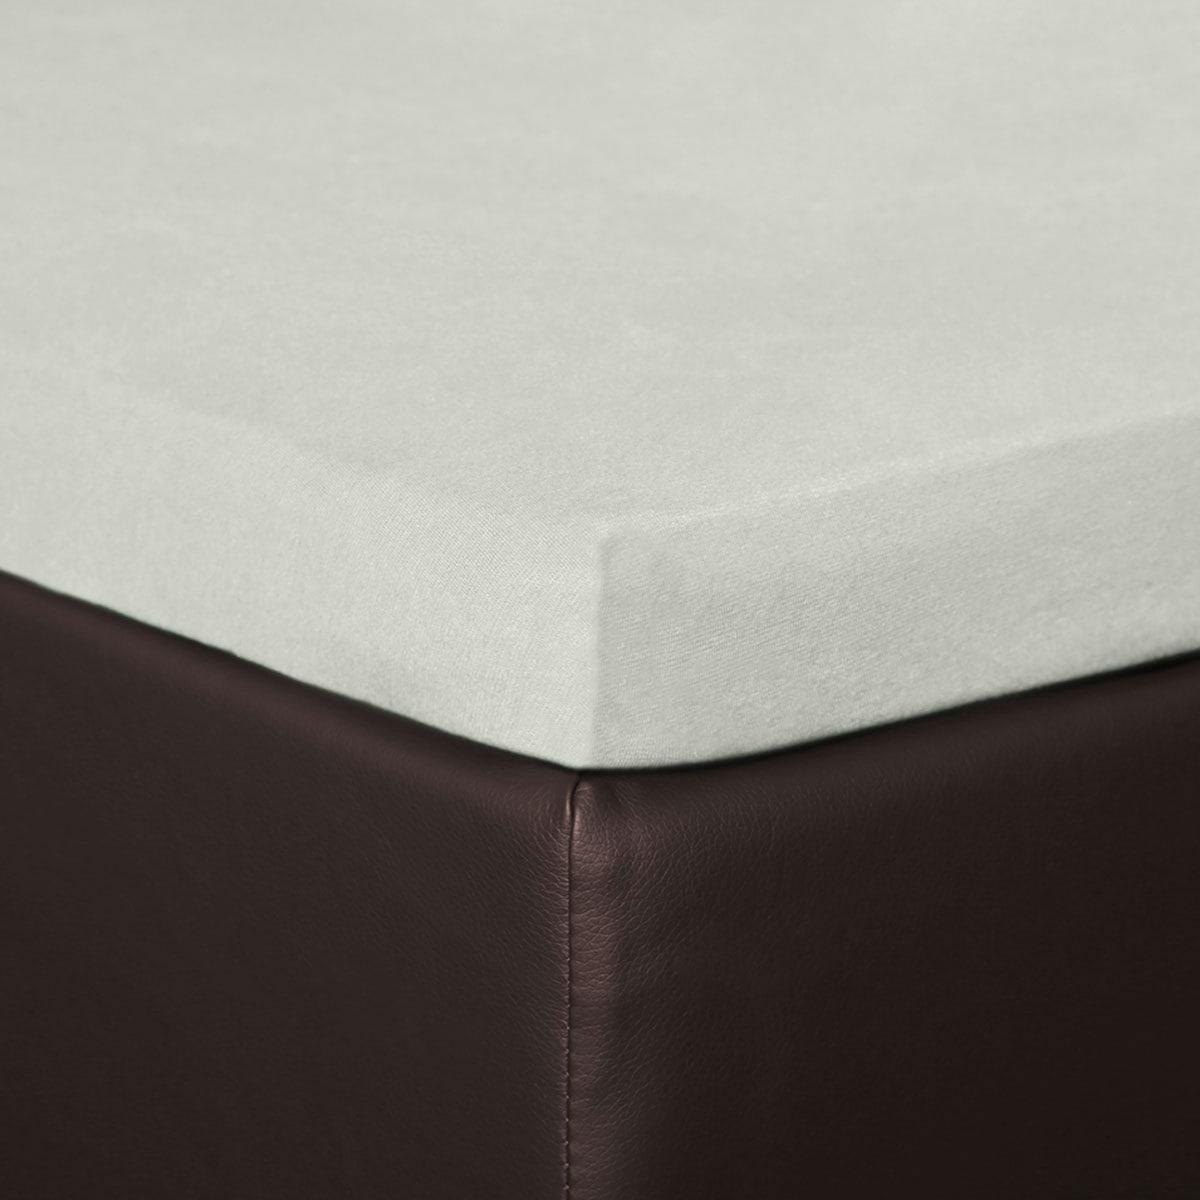 bettwarenshop boxspring topper spannbettlaken h he 5 cm. Black Bedroom Furniture Sets. Home Design Ideas